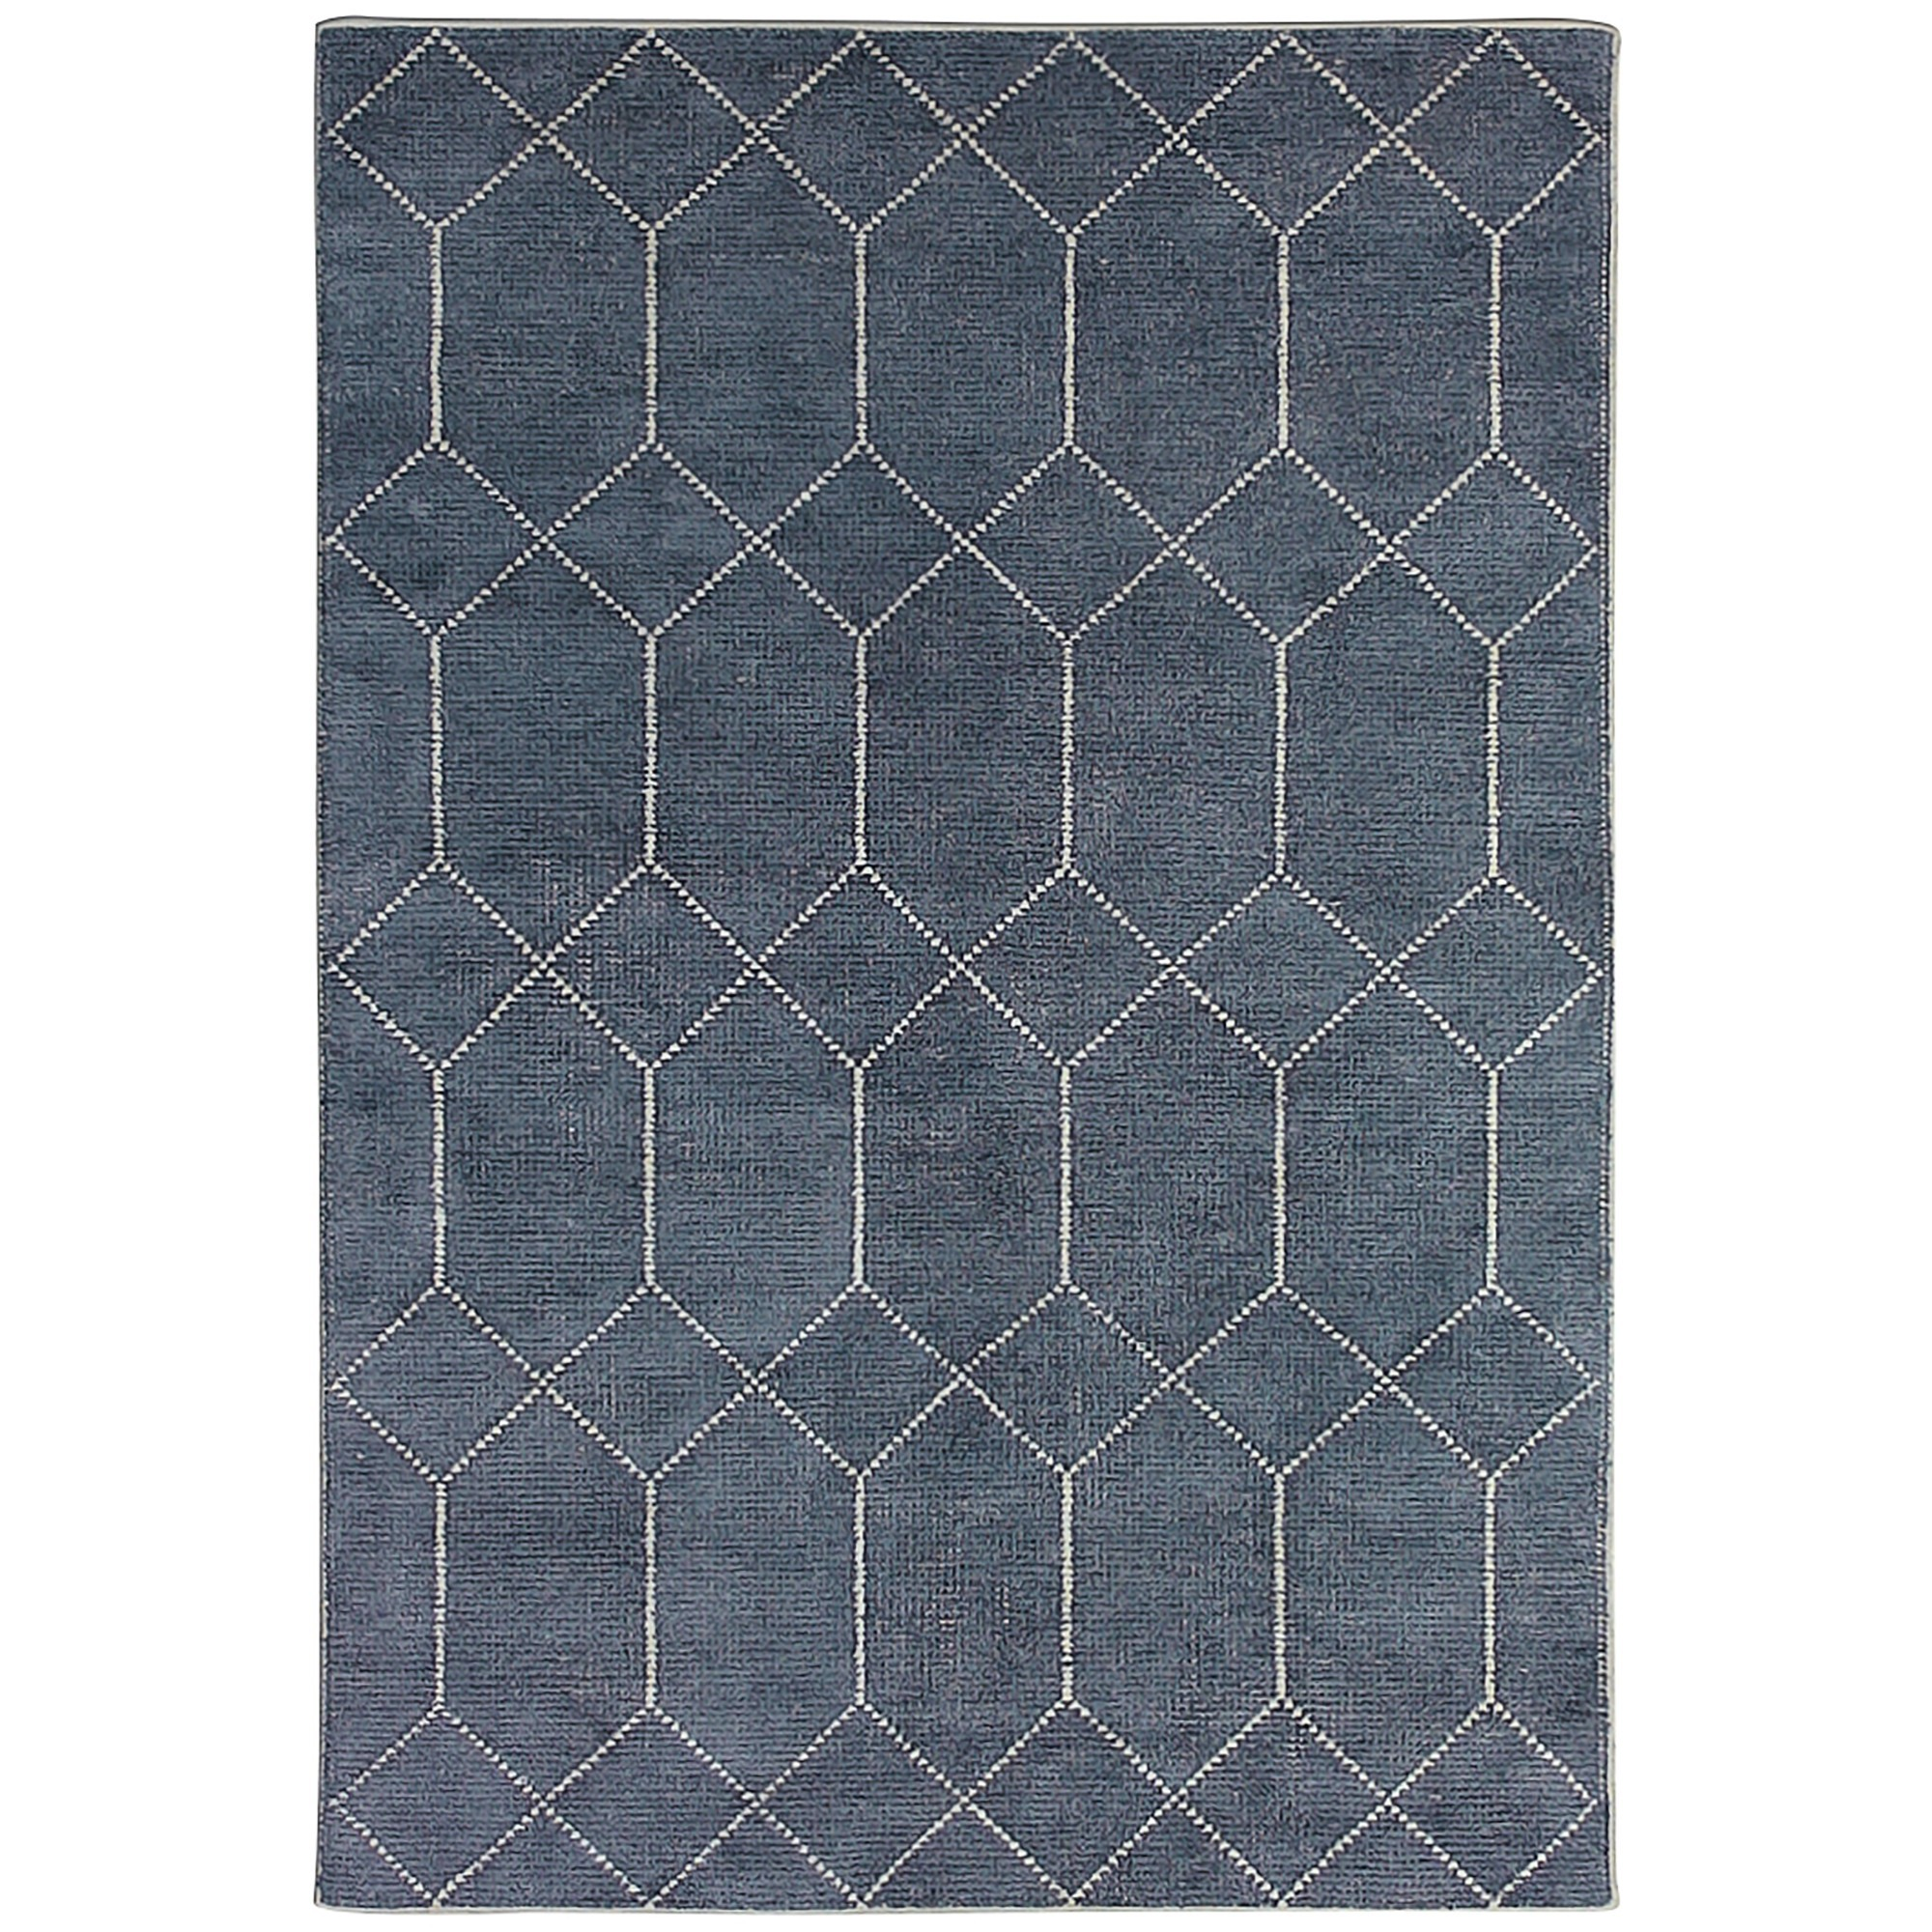 Geometrics Hand Knotted Wool Rug, 350x450cm, Storm